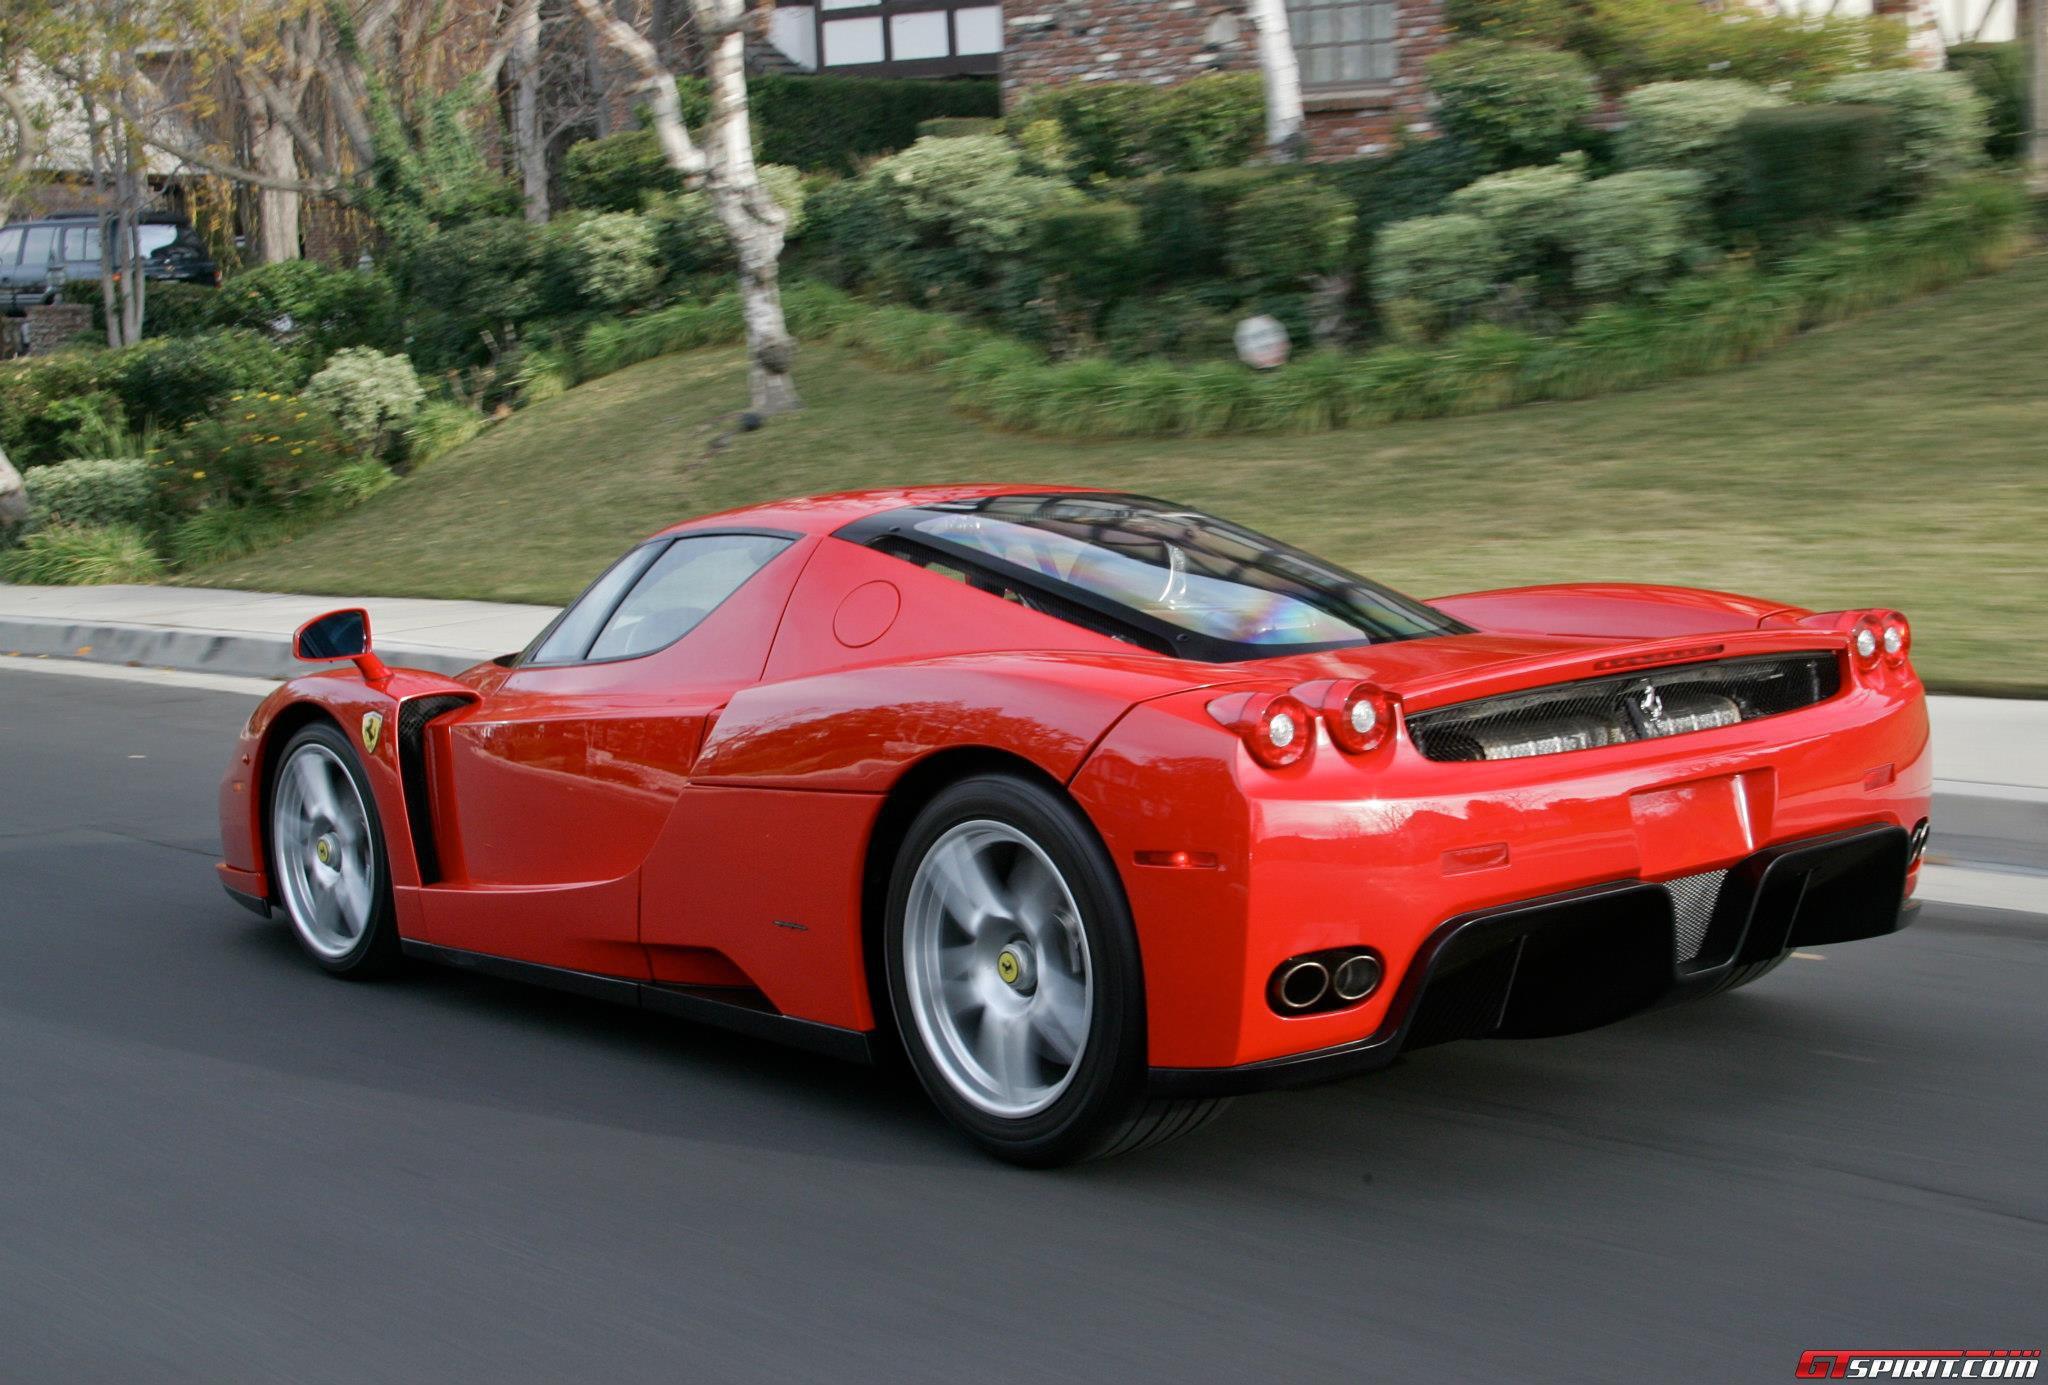 San Francisco Motorsports Ferrari Service And Sales Bay